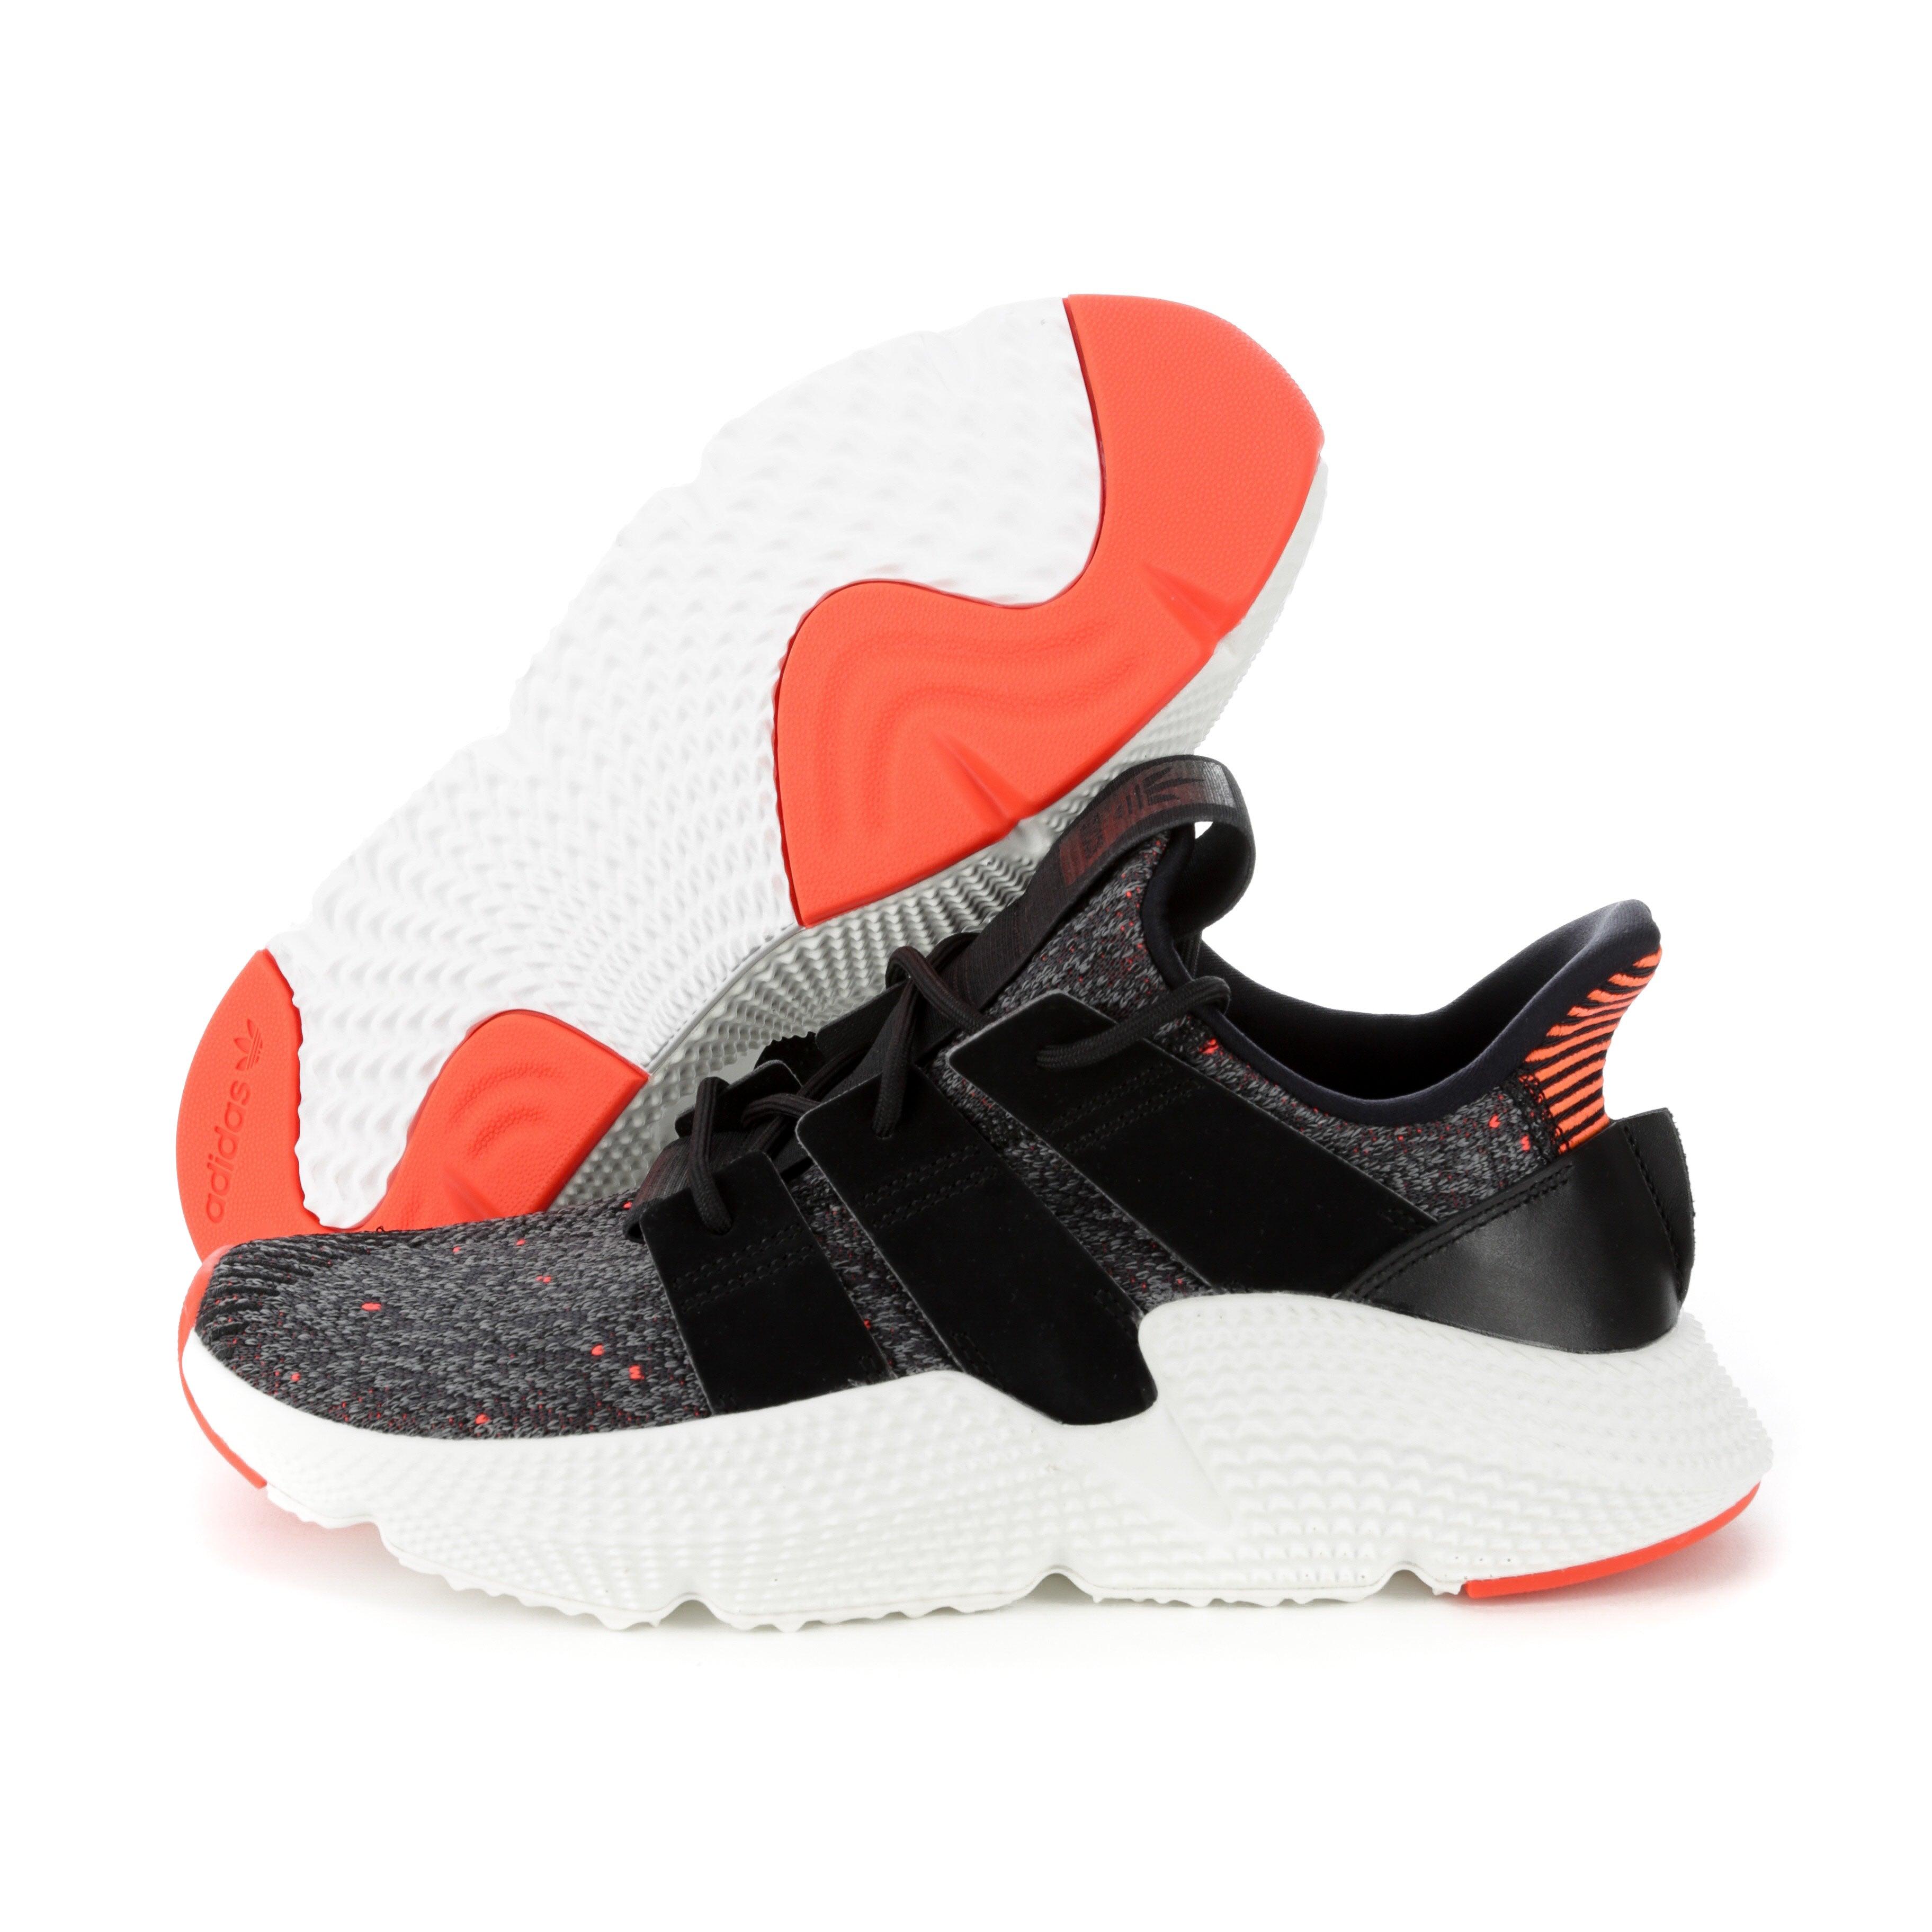 adidas Originals Prophere: Night Cargo | Sneakers men